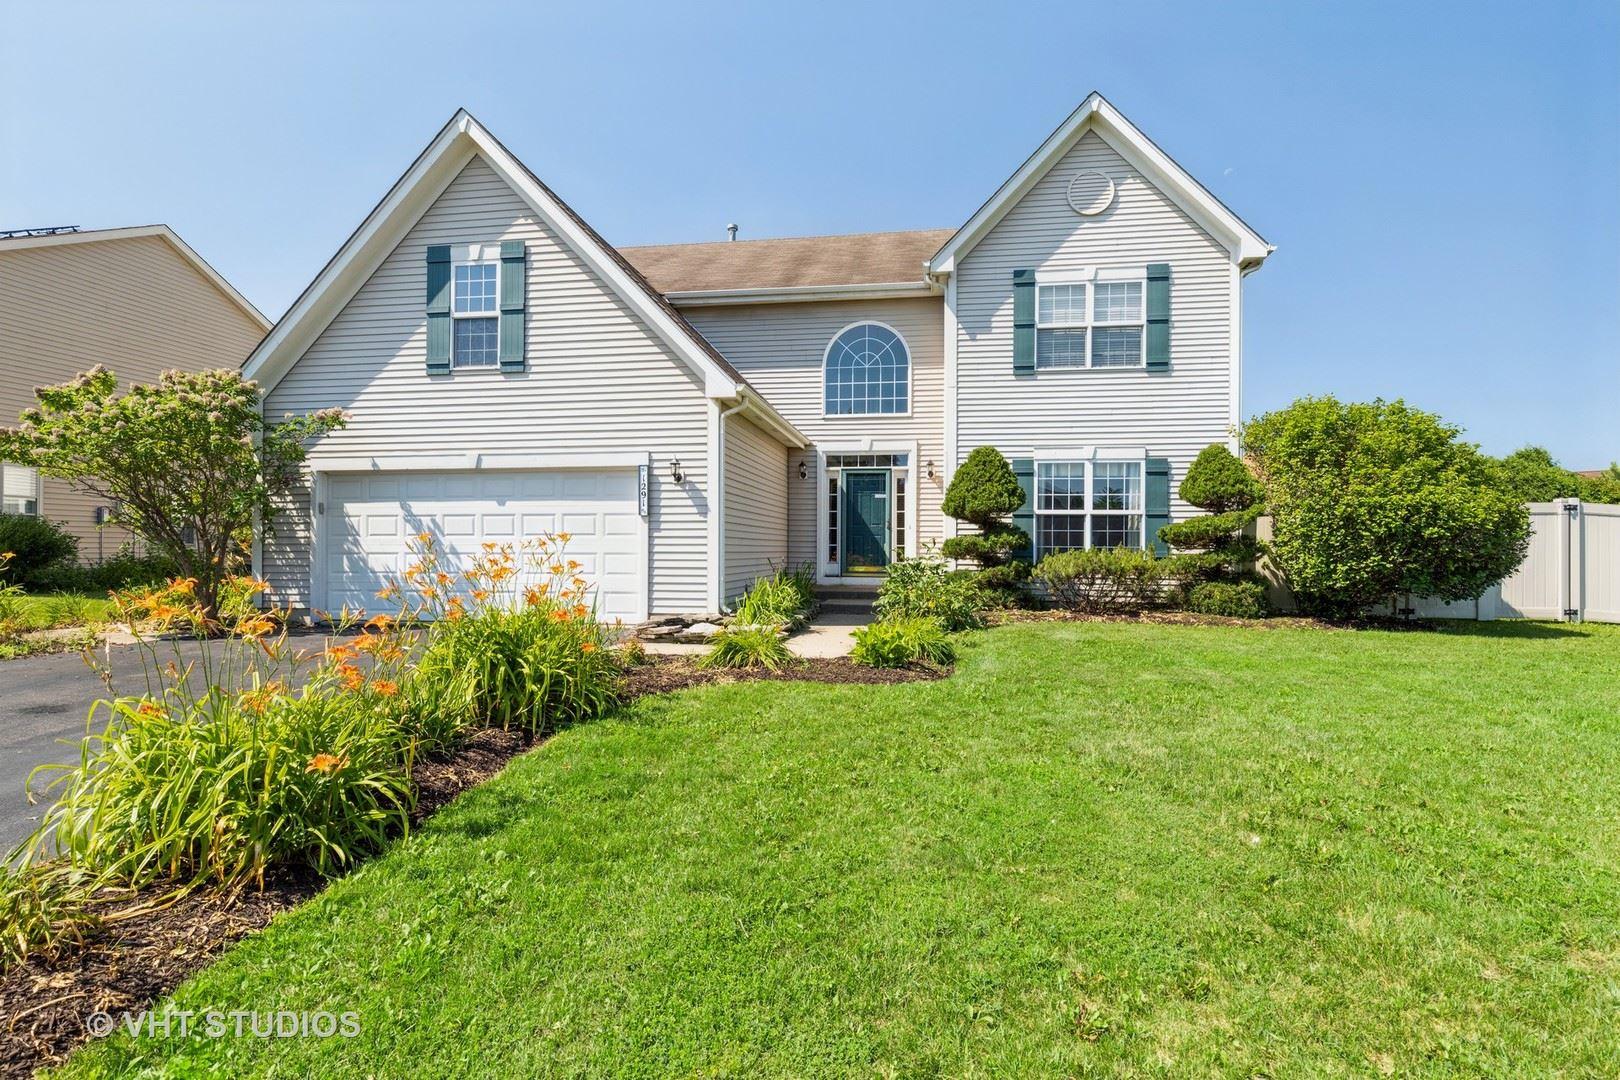 1291 Amberwood Drive, Crystal Lake, IL 60014 - #: 11133129